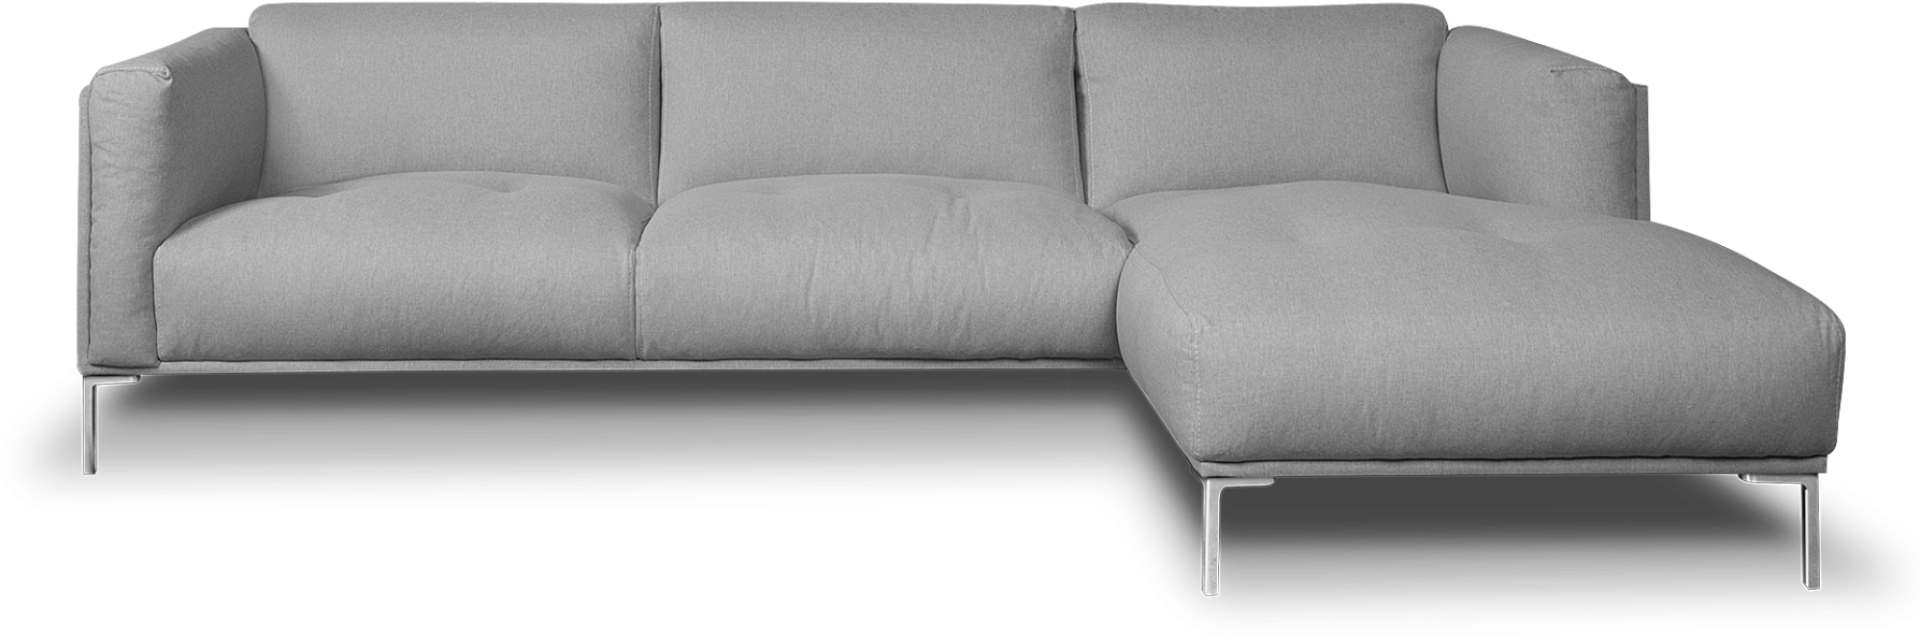 i Sofa Oliver hoekbank GrijsWoonkamer